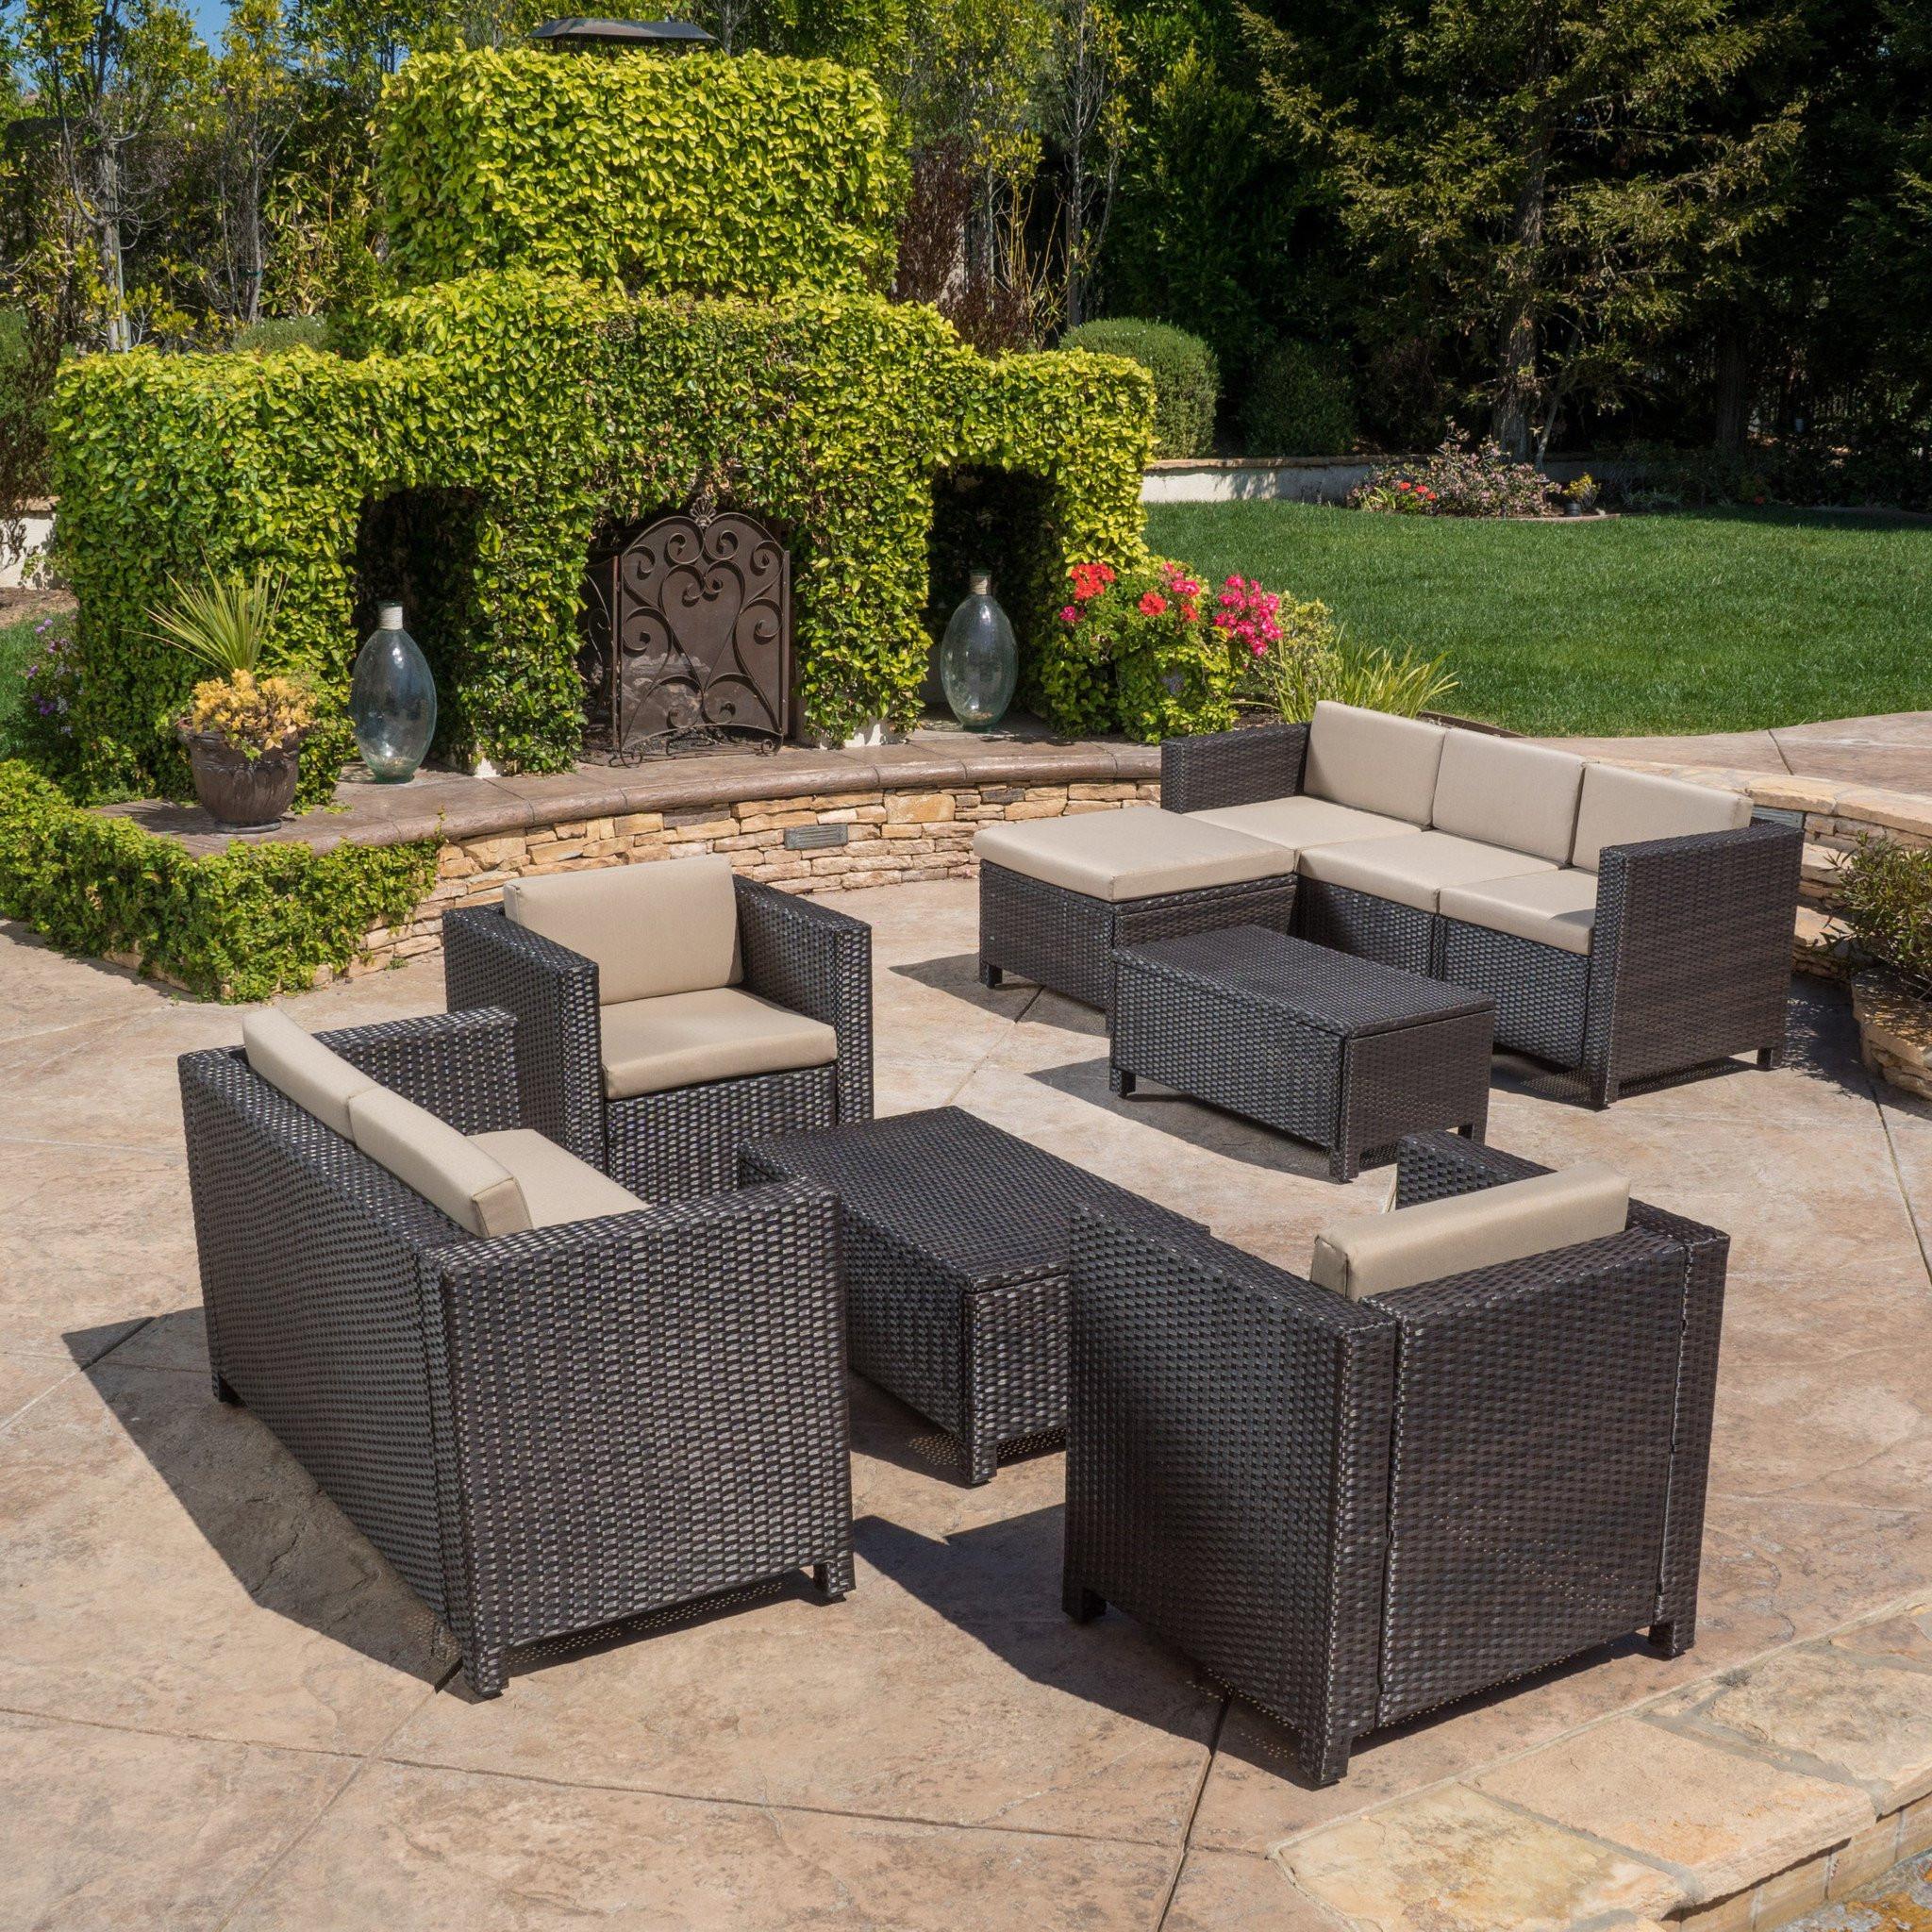 Budva 9pc Outdoor Wicker Sectional Sofa Set w/ Cus...